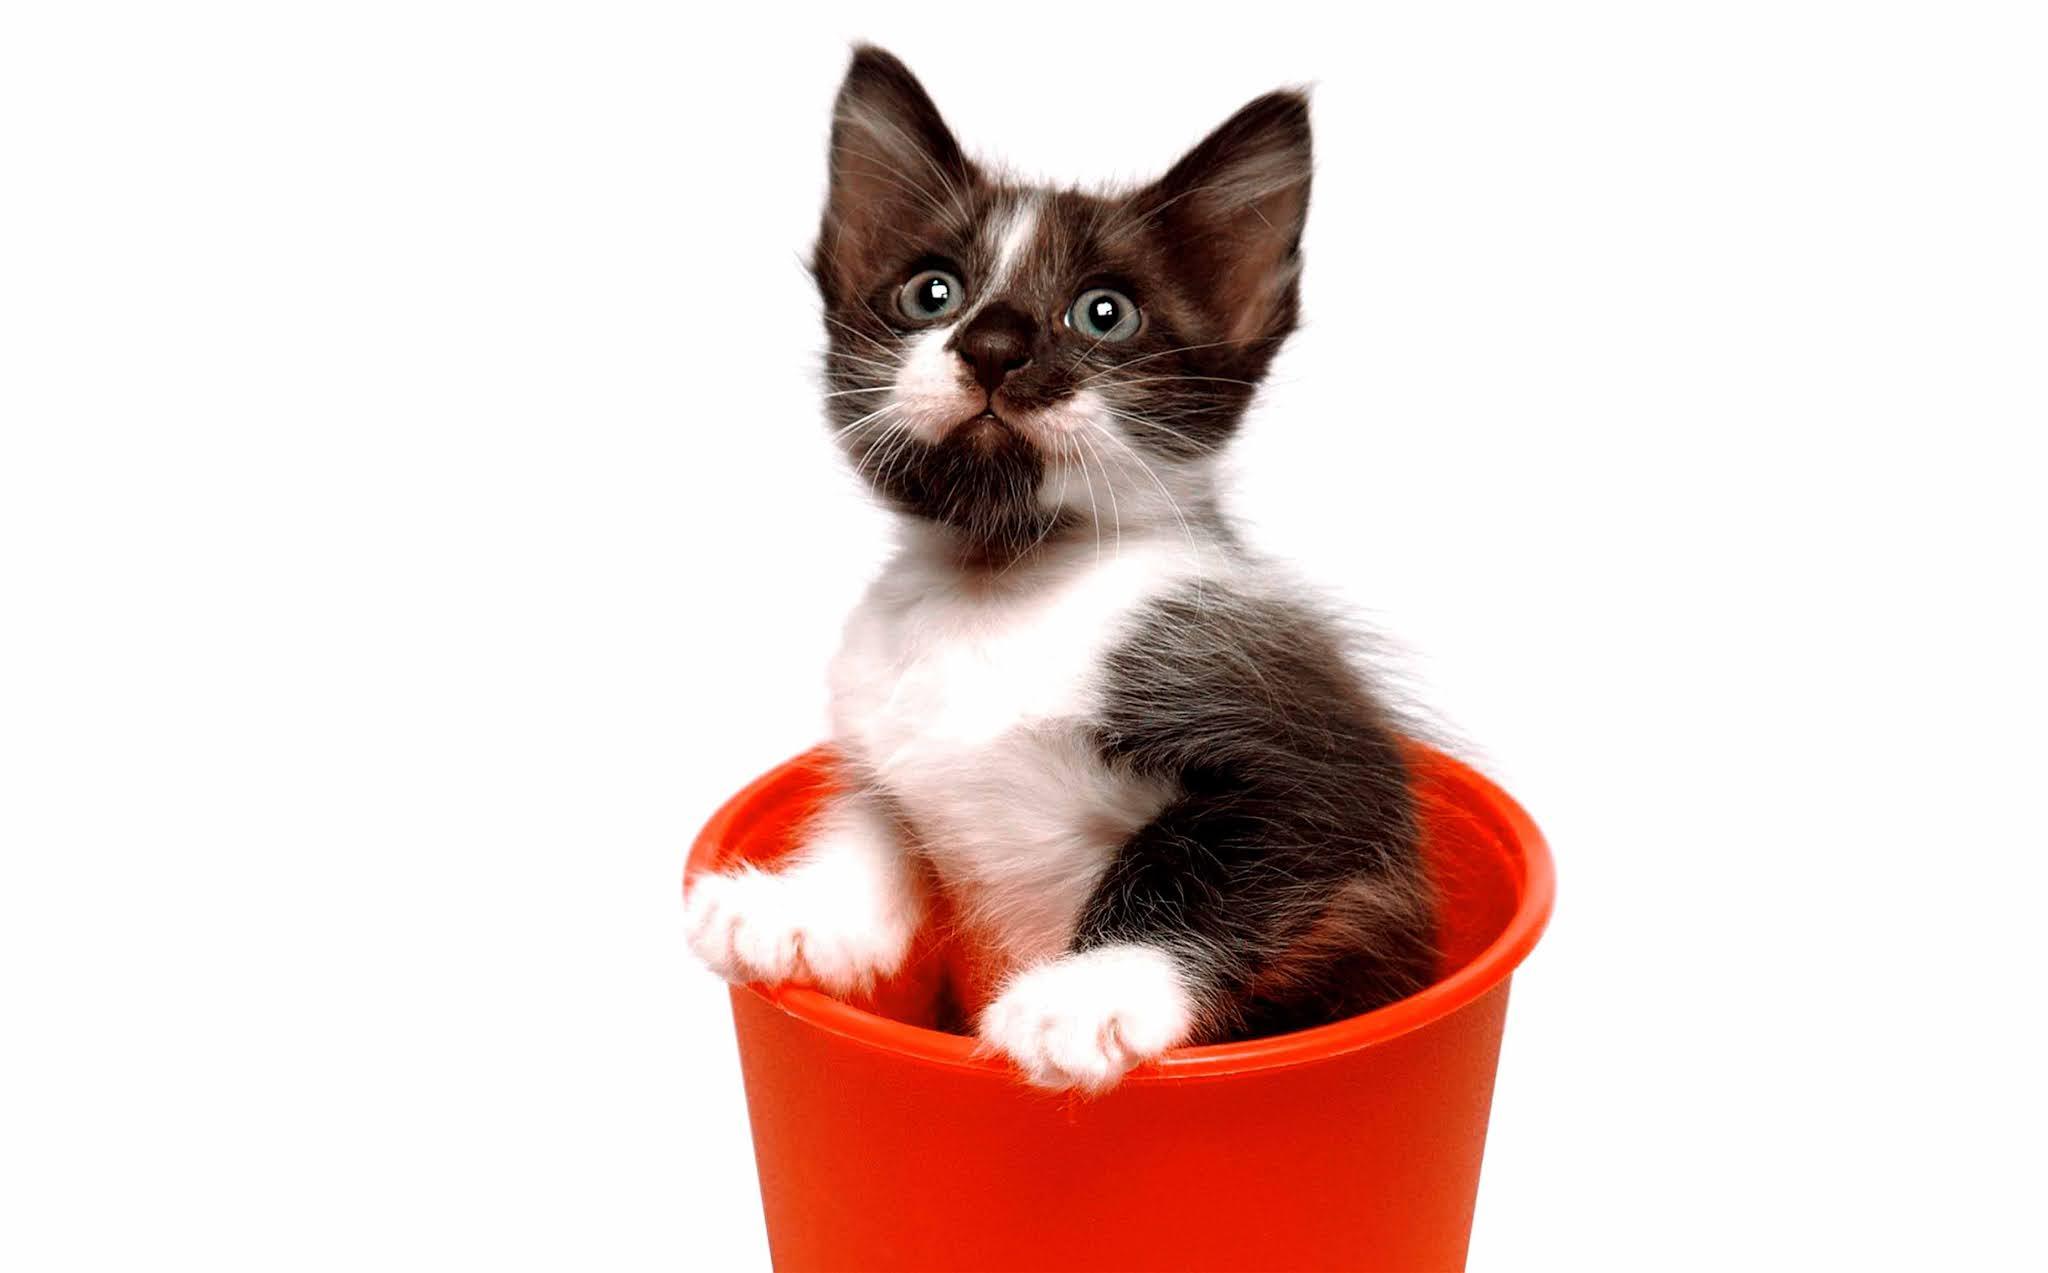 21 Best of wallpaper image kitten, cat, animal, cute, brown wallpaper, background HD 5K 8K for computer desktop